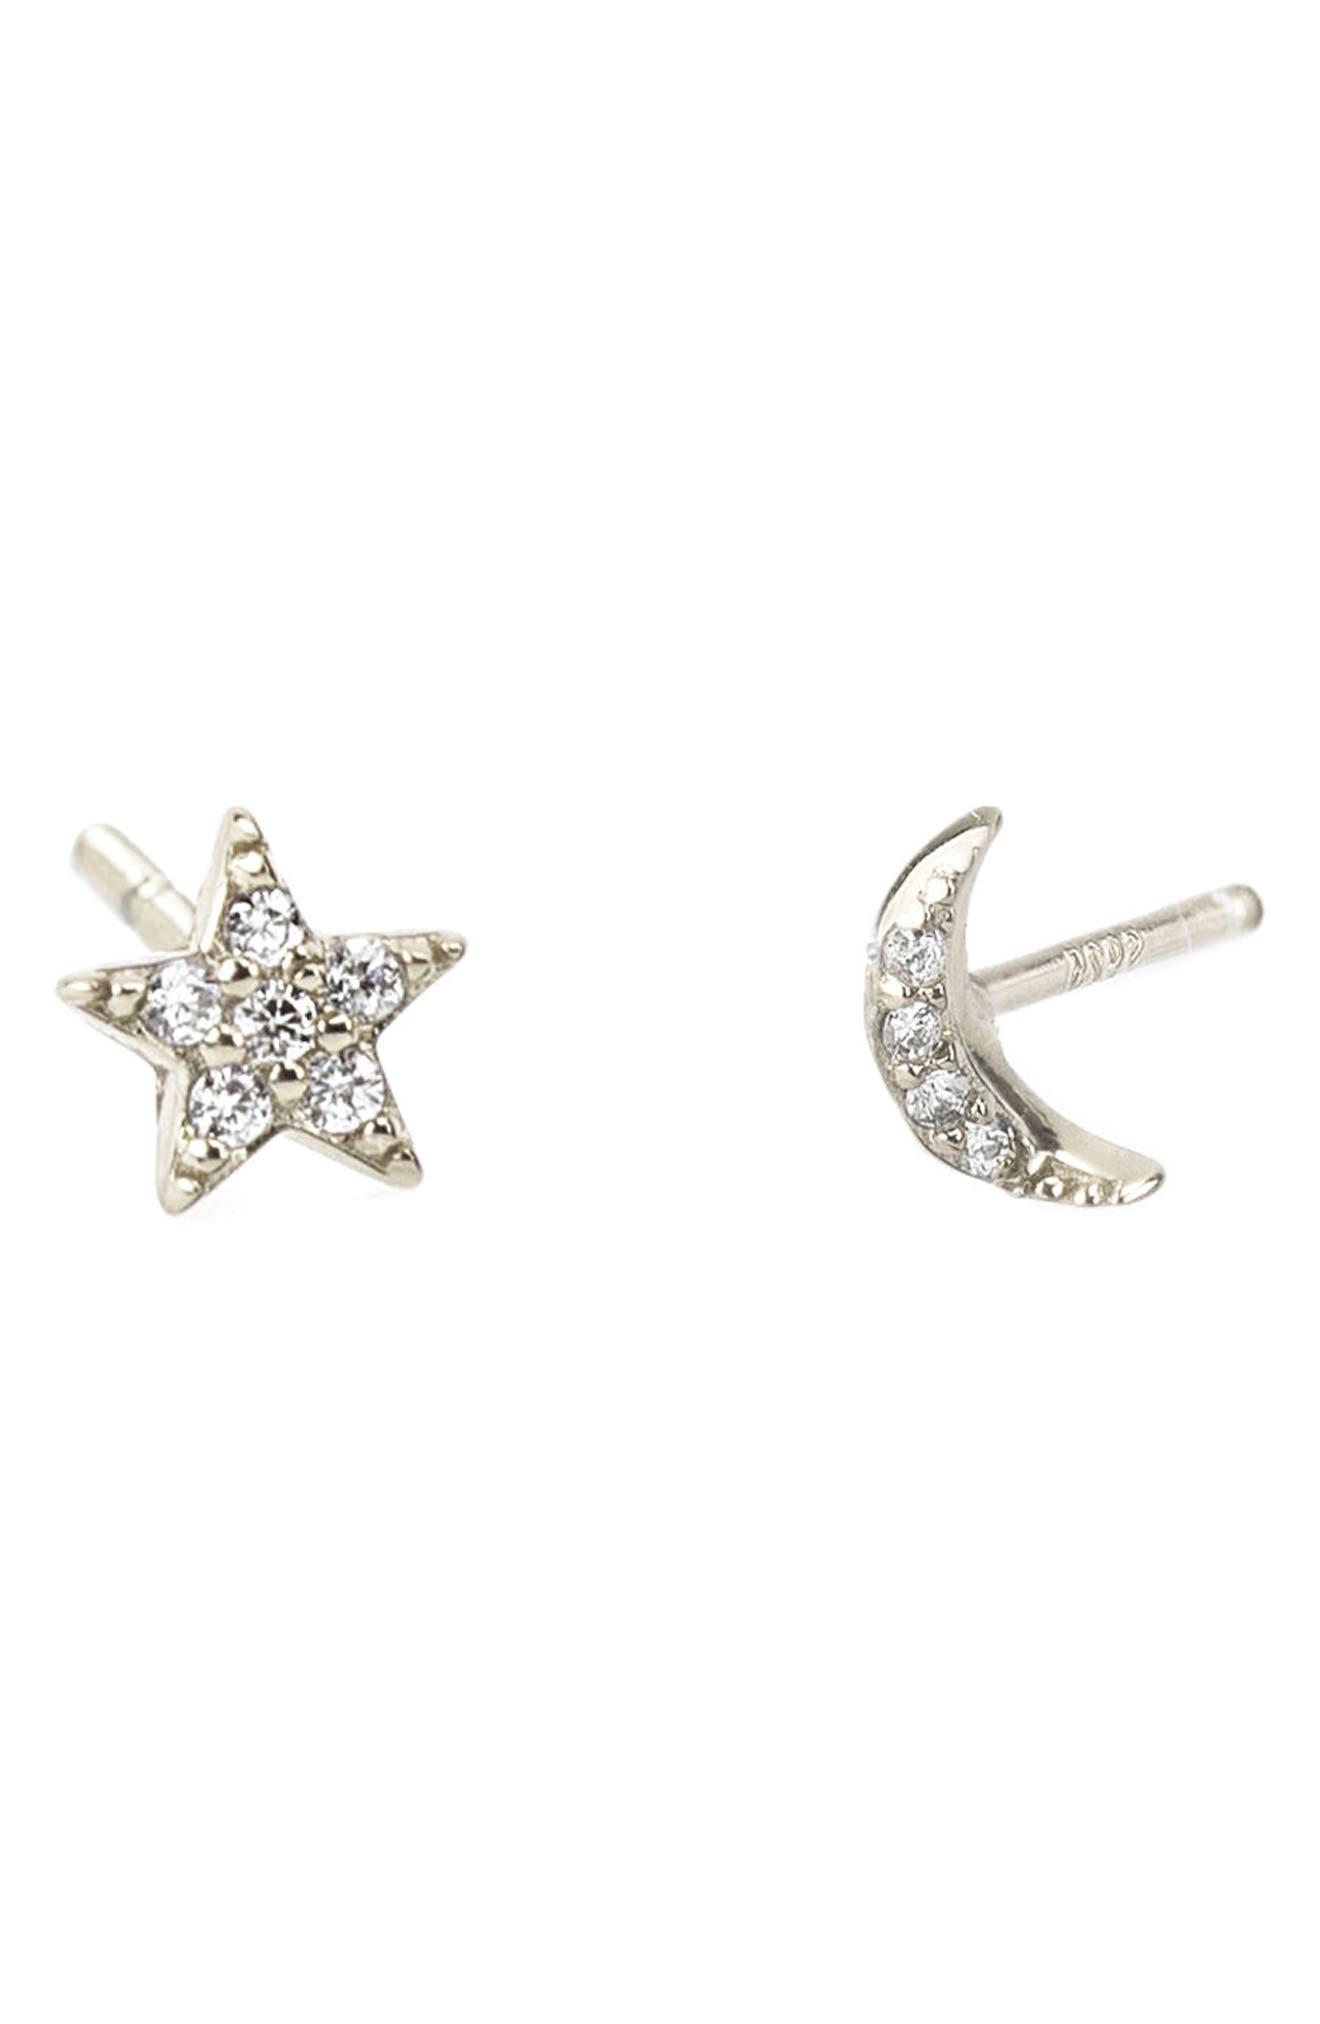 Main Image - Kris Nations Pavé Star & Moon Stud Earrings